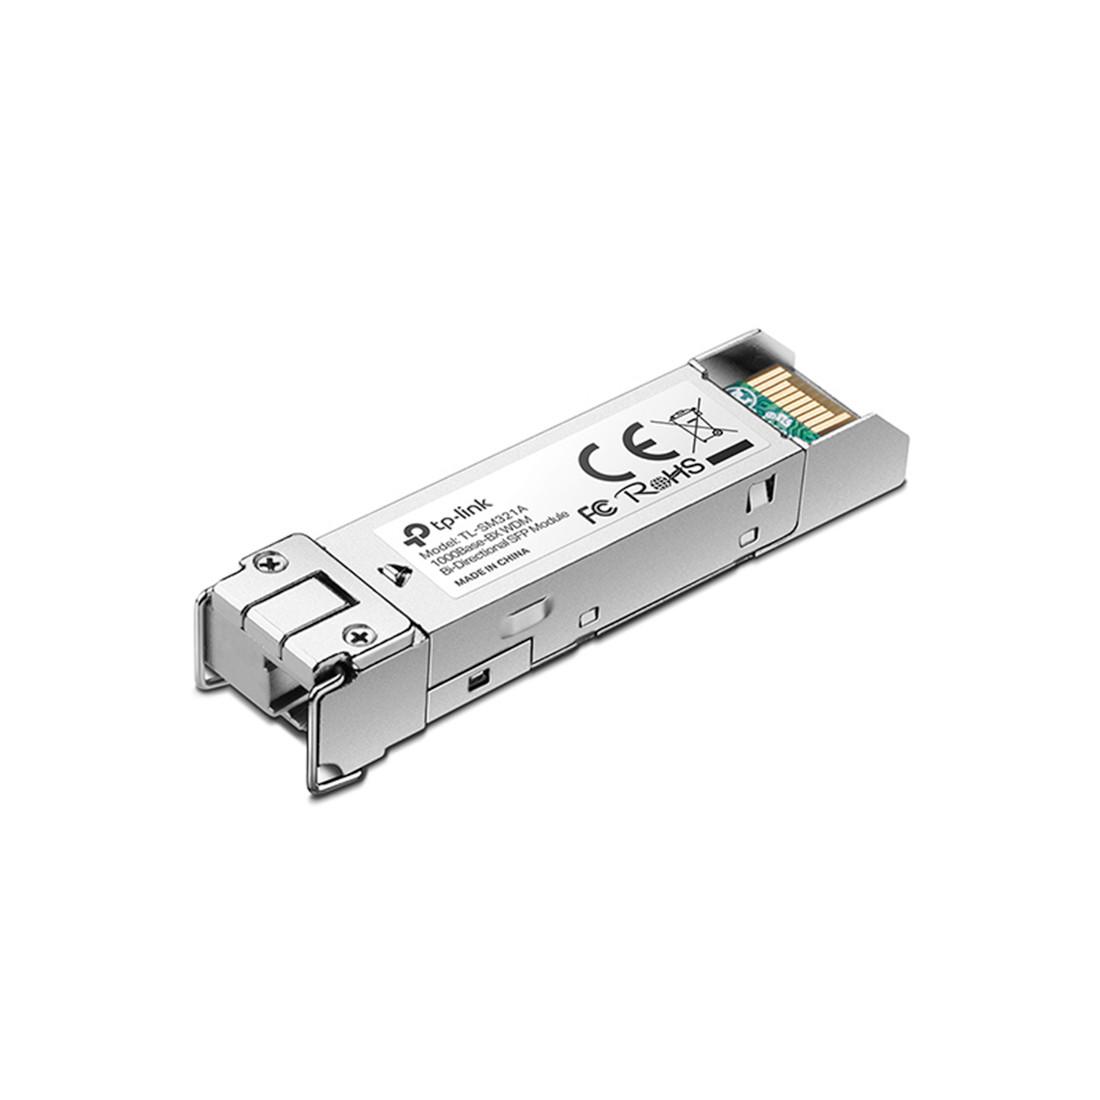 TP-LINK TL-SM321A  1000Base-BX WDM двунаправленный SFP модуль